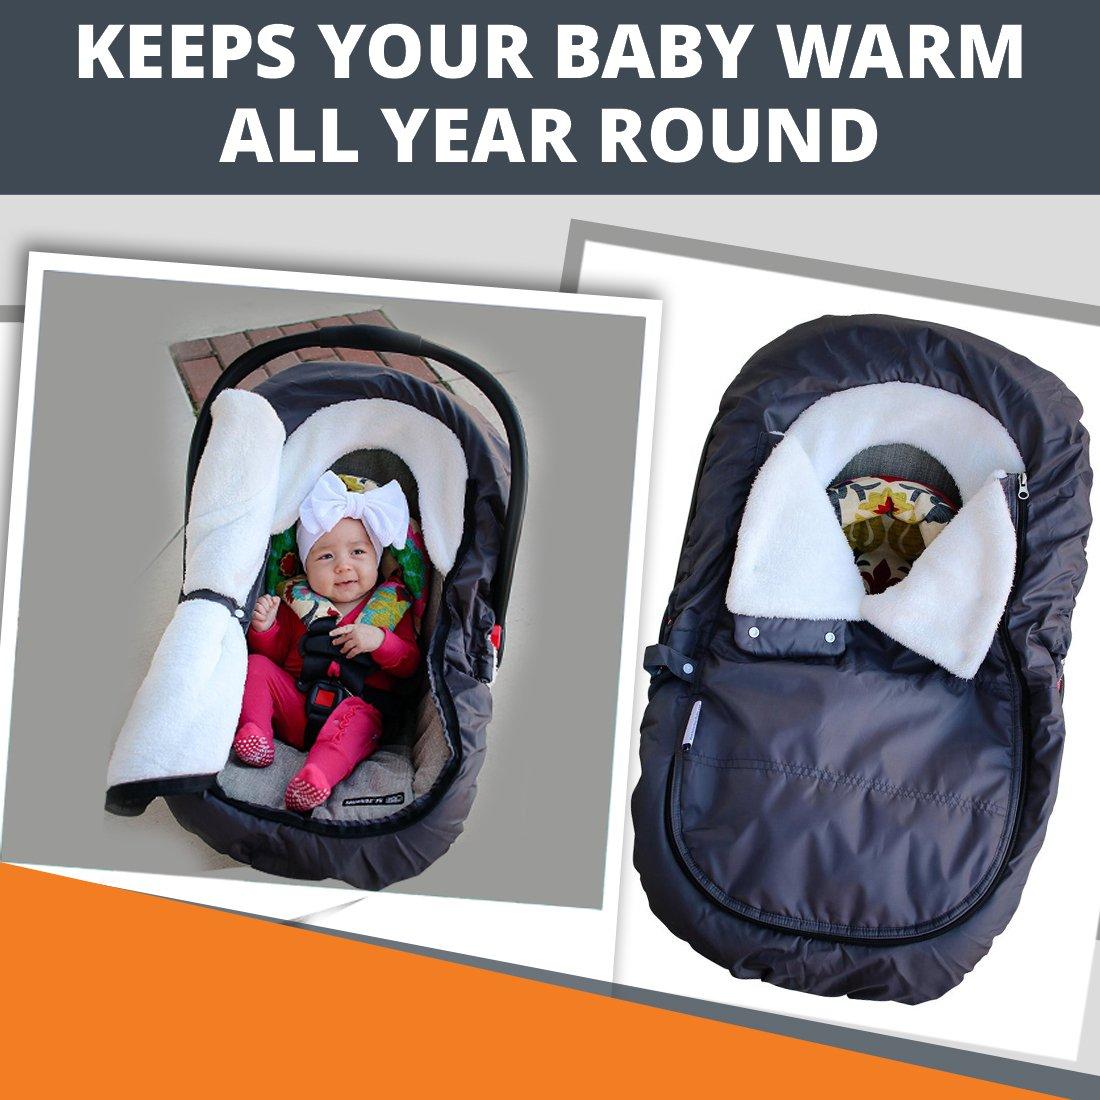 Amazon.com: Infant Baby Car Seat Cover - Weatherproof Sneak ...